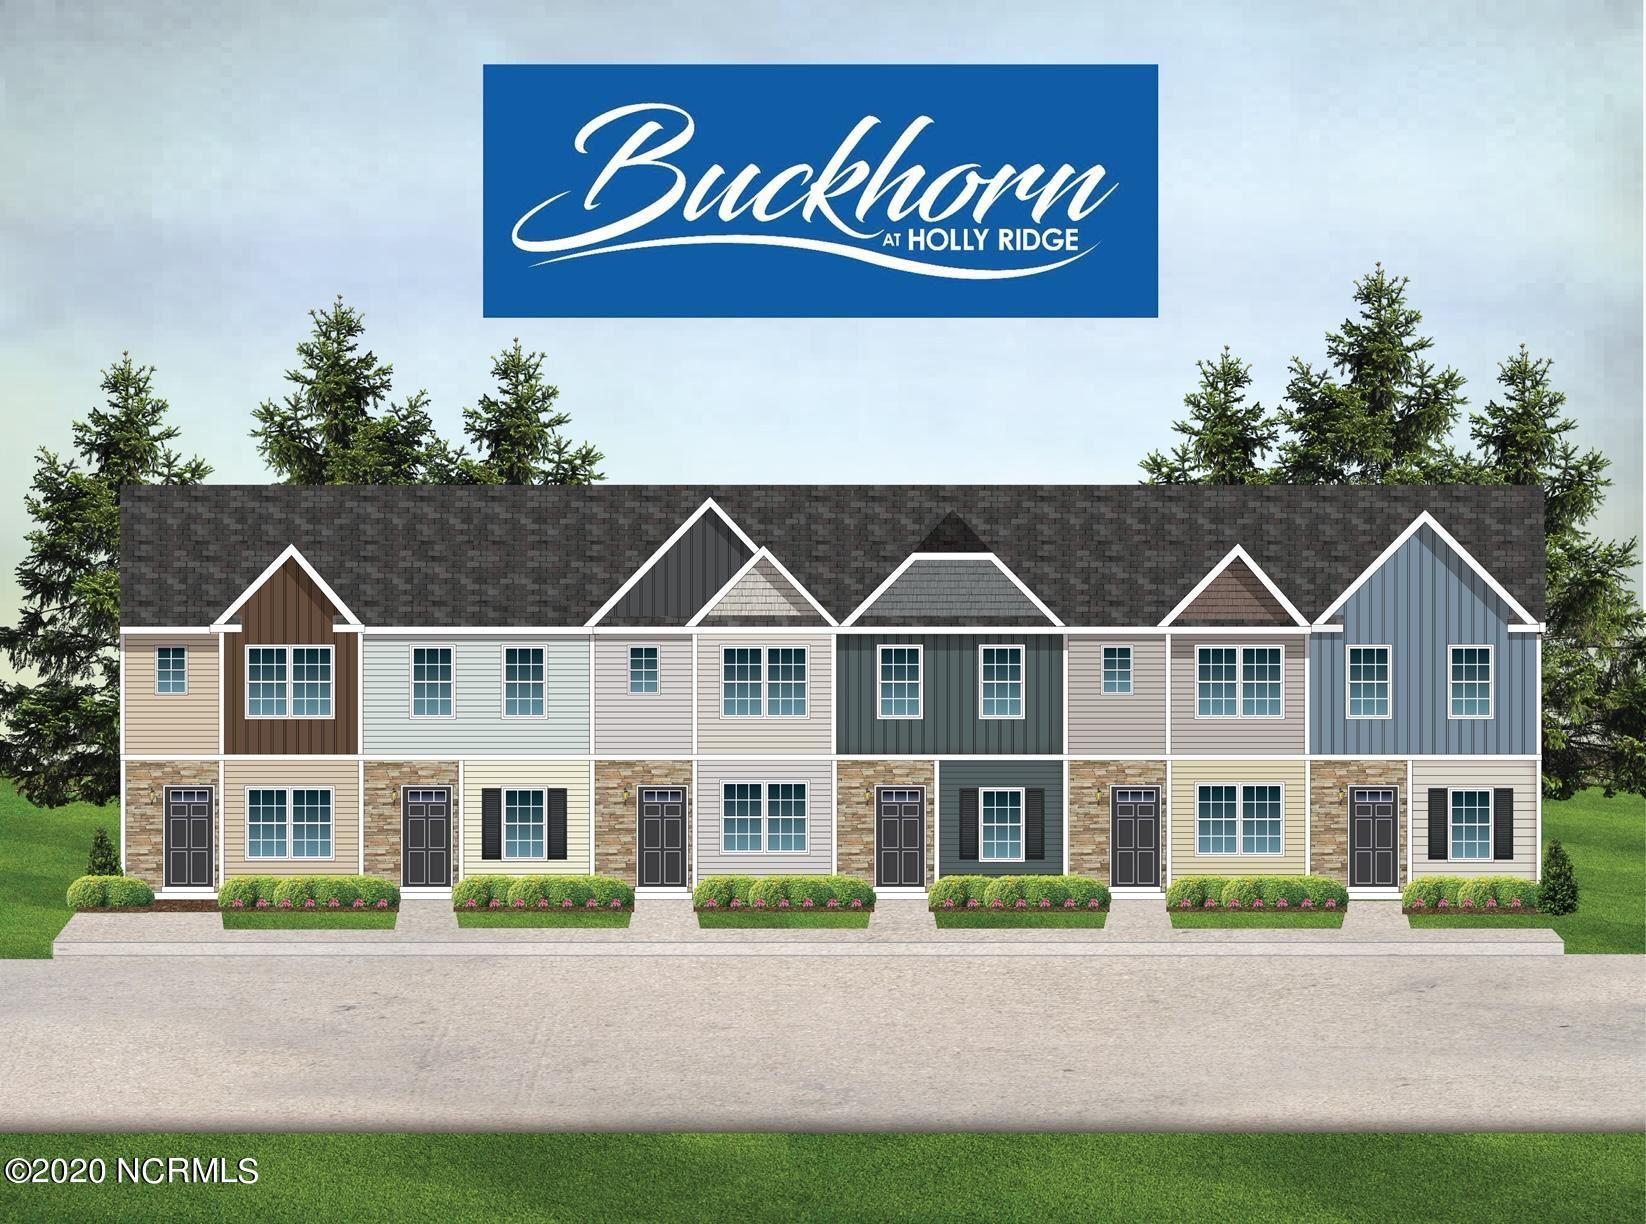 Photo for 165 Buckhorn Avenue, Holly Ridge, NC 28445 (MLS # 100250184)